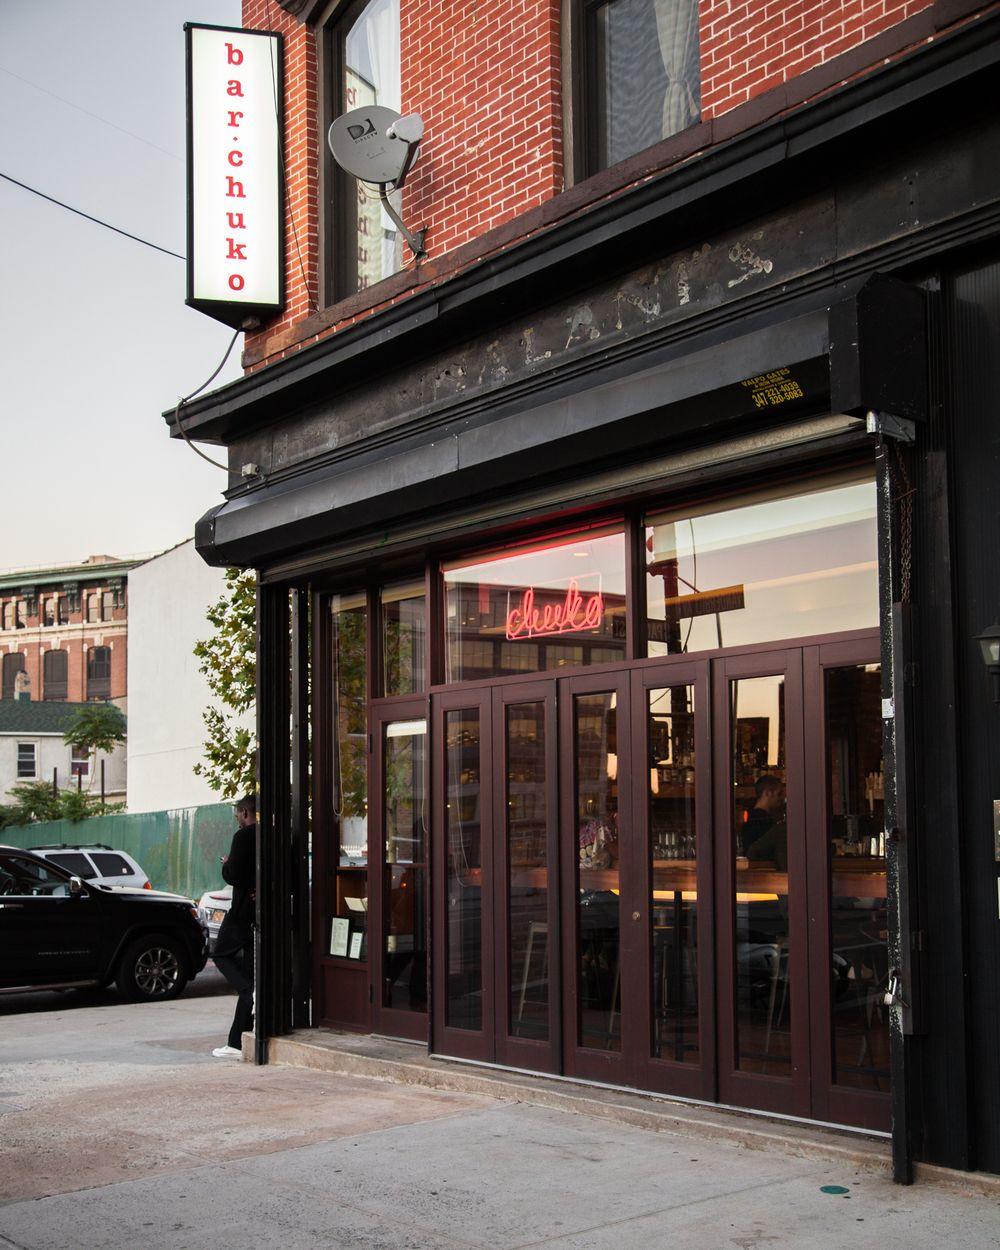 Brooklyn restaurant, Nyc trip, New york eats